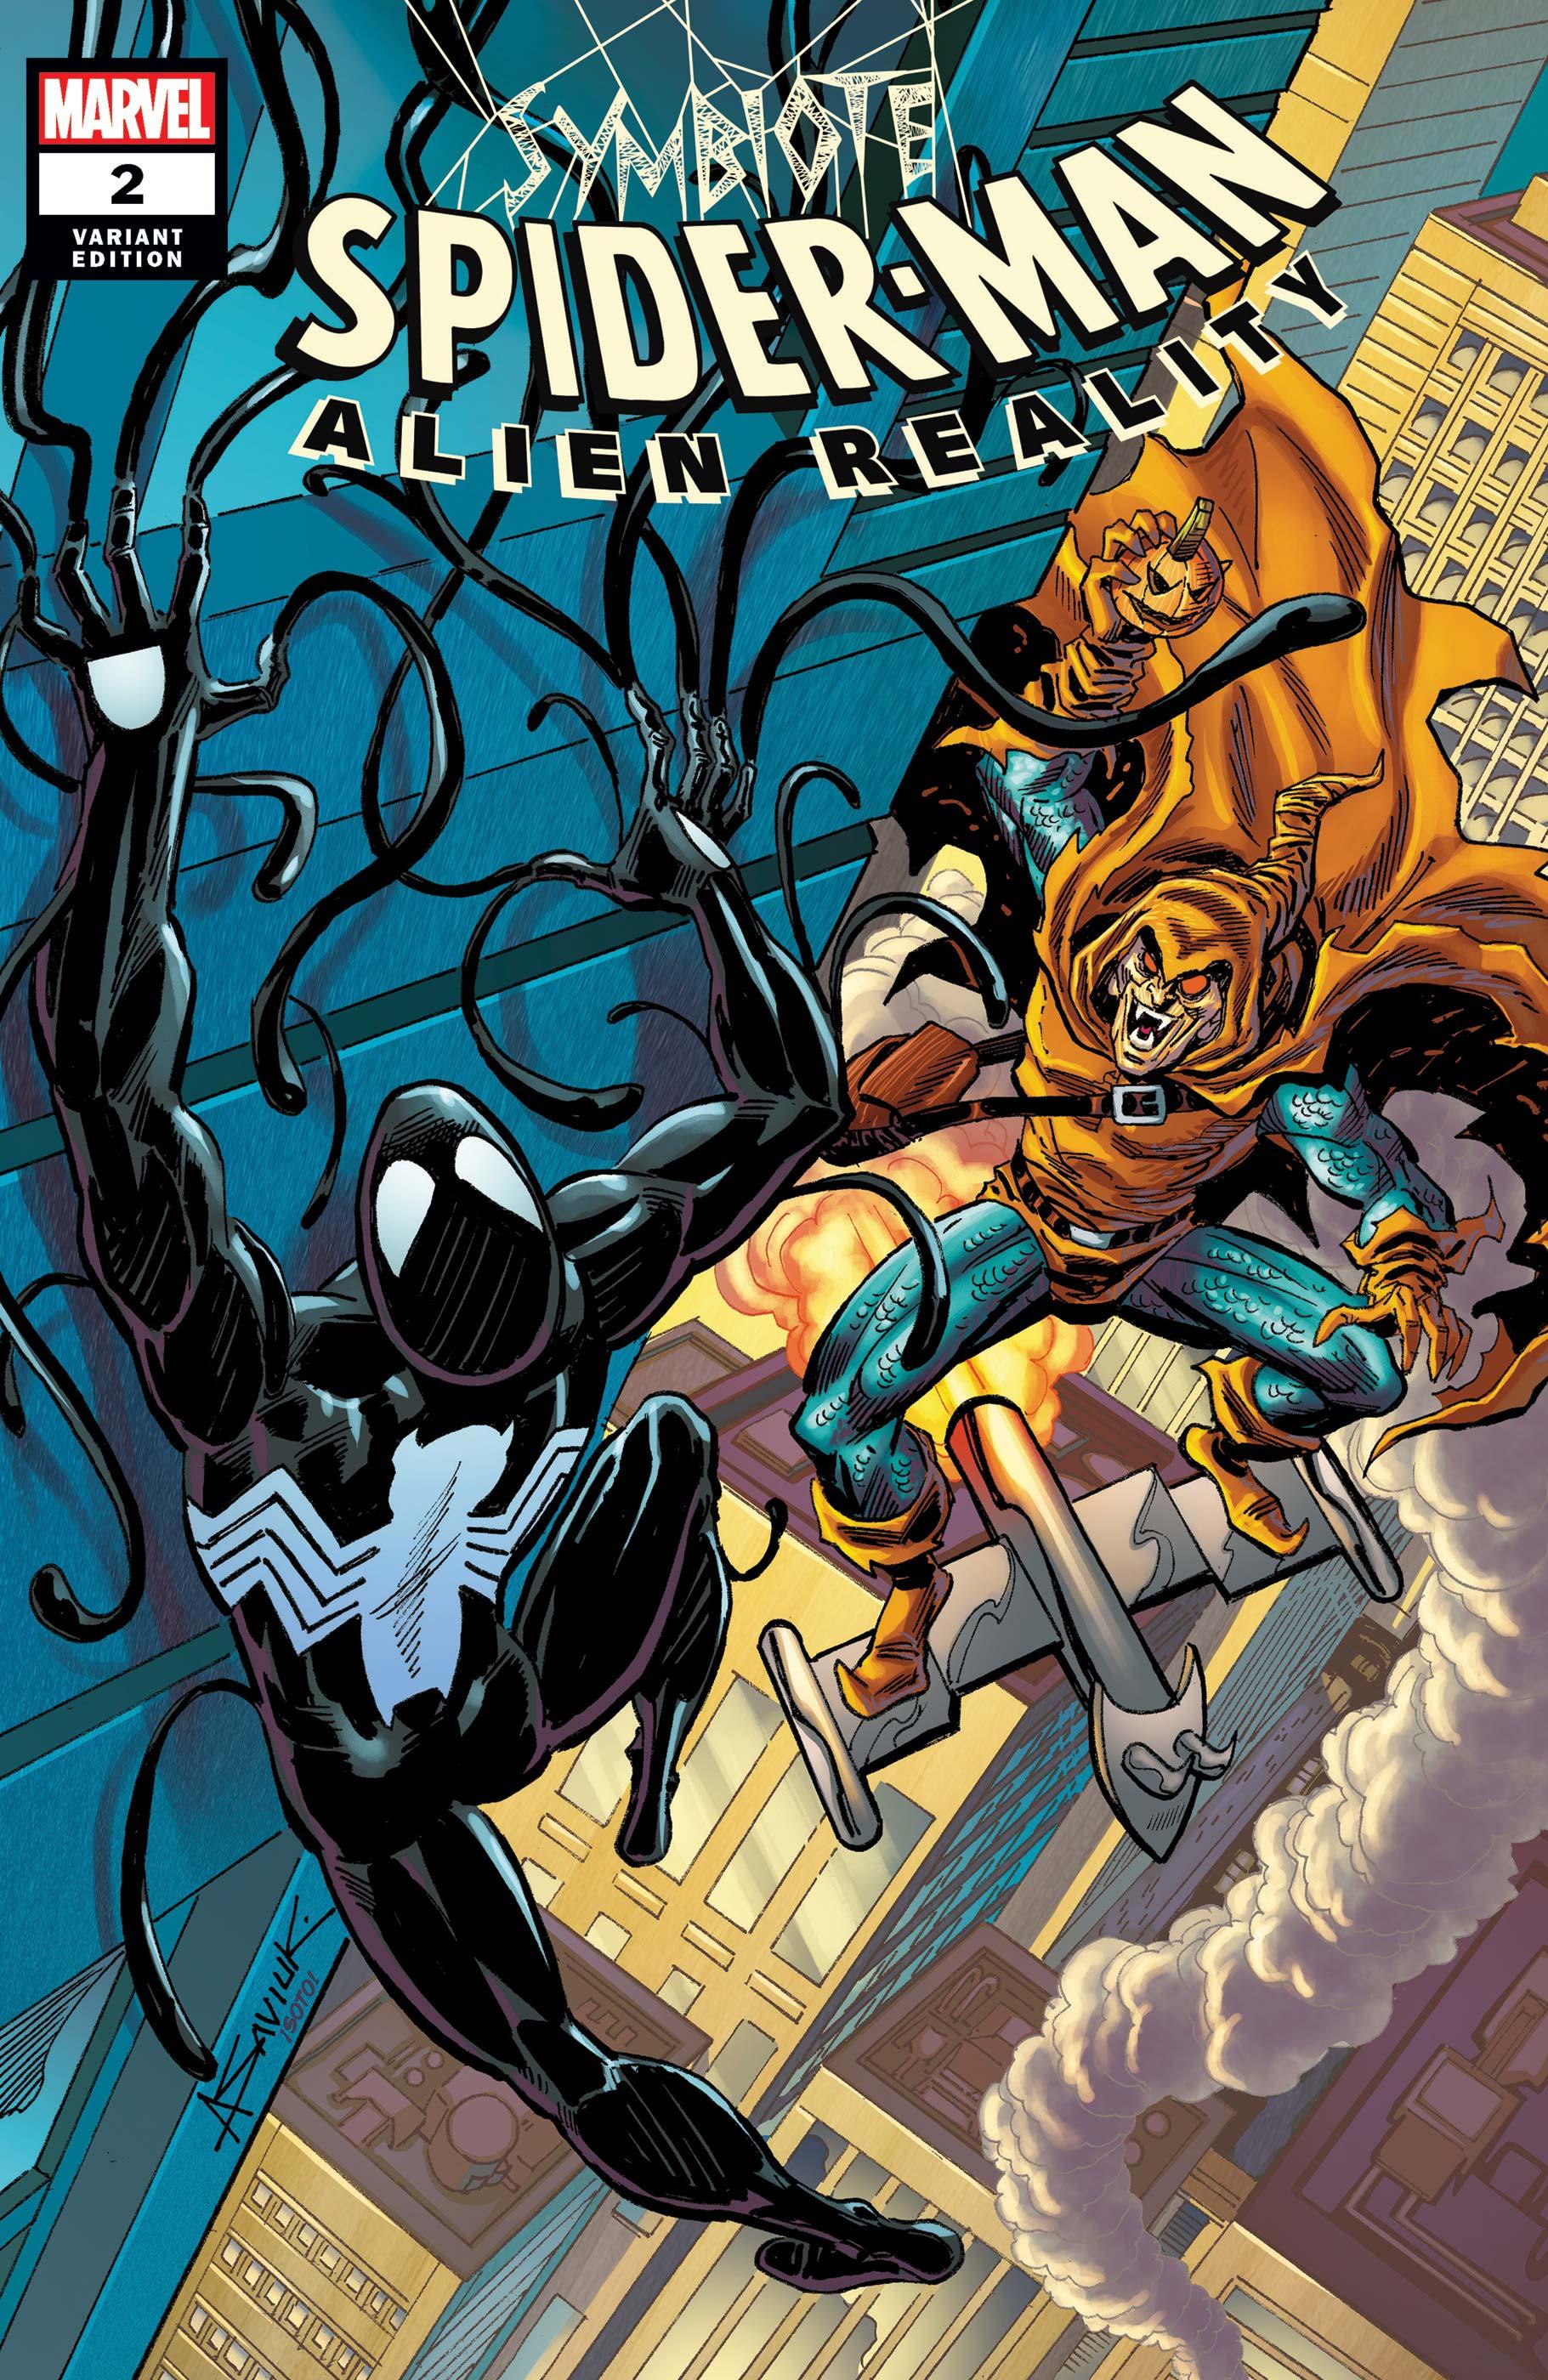 Symbiote Spider-Man: Alien Reality (2019) #2 (Variant)